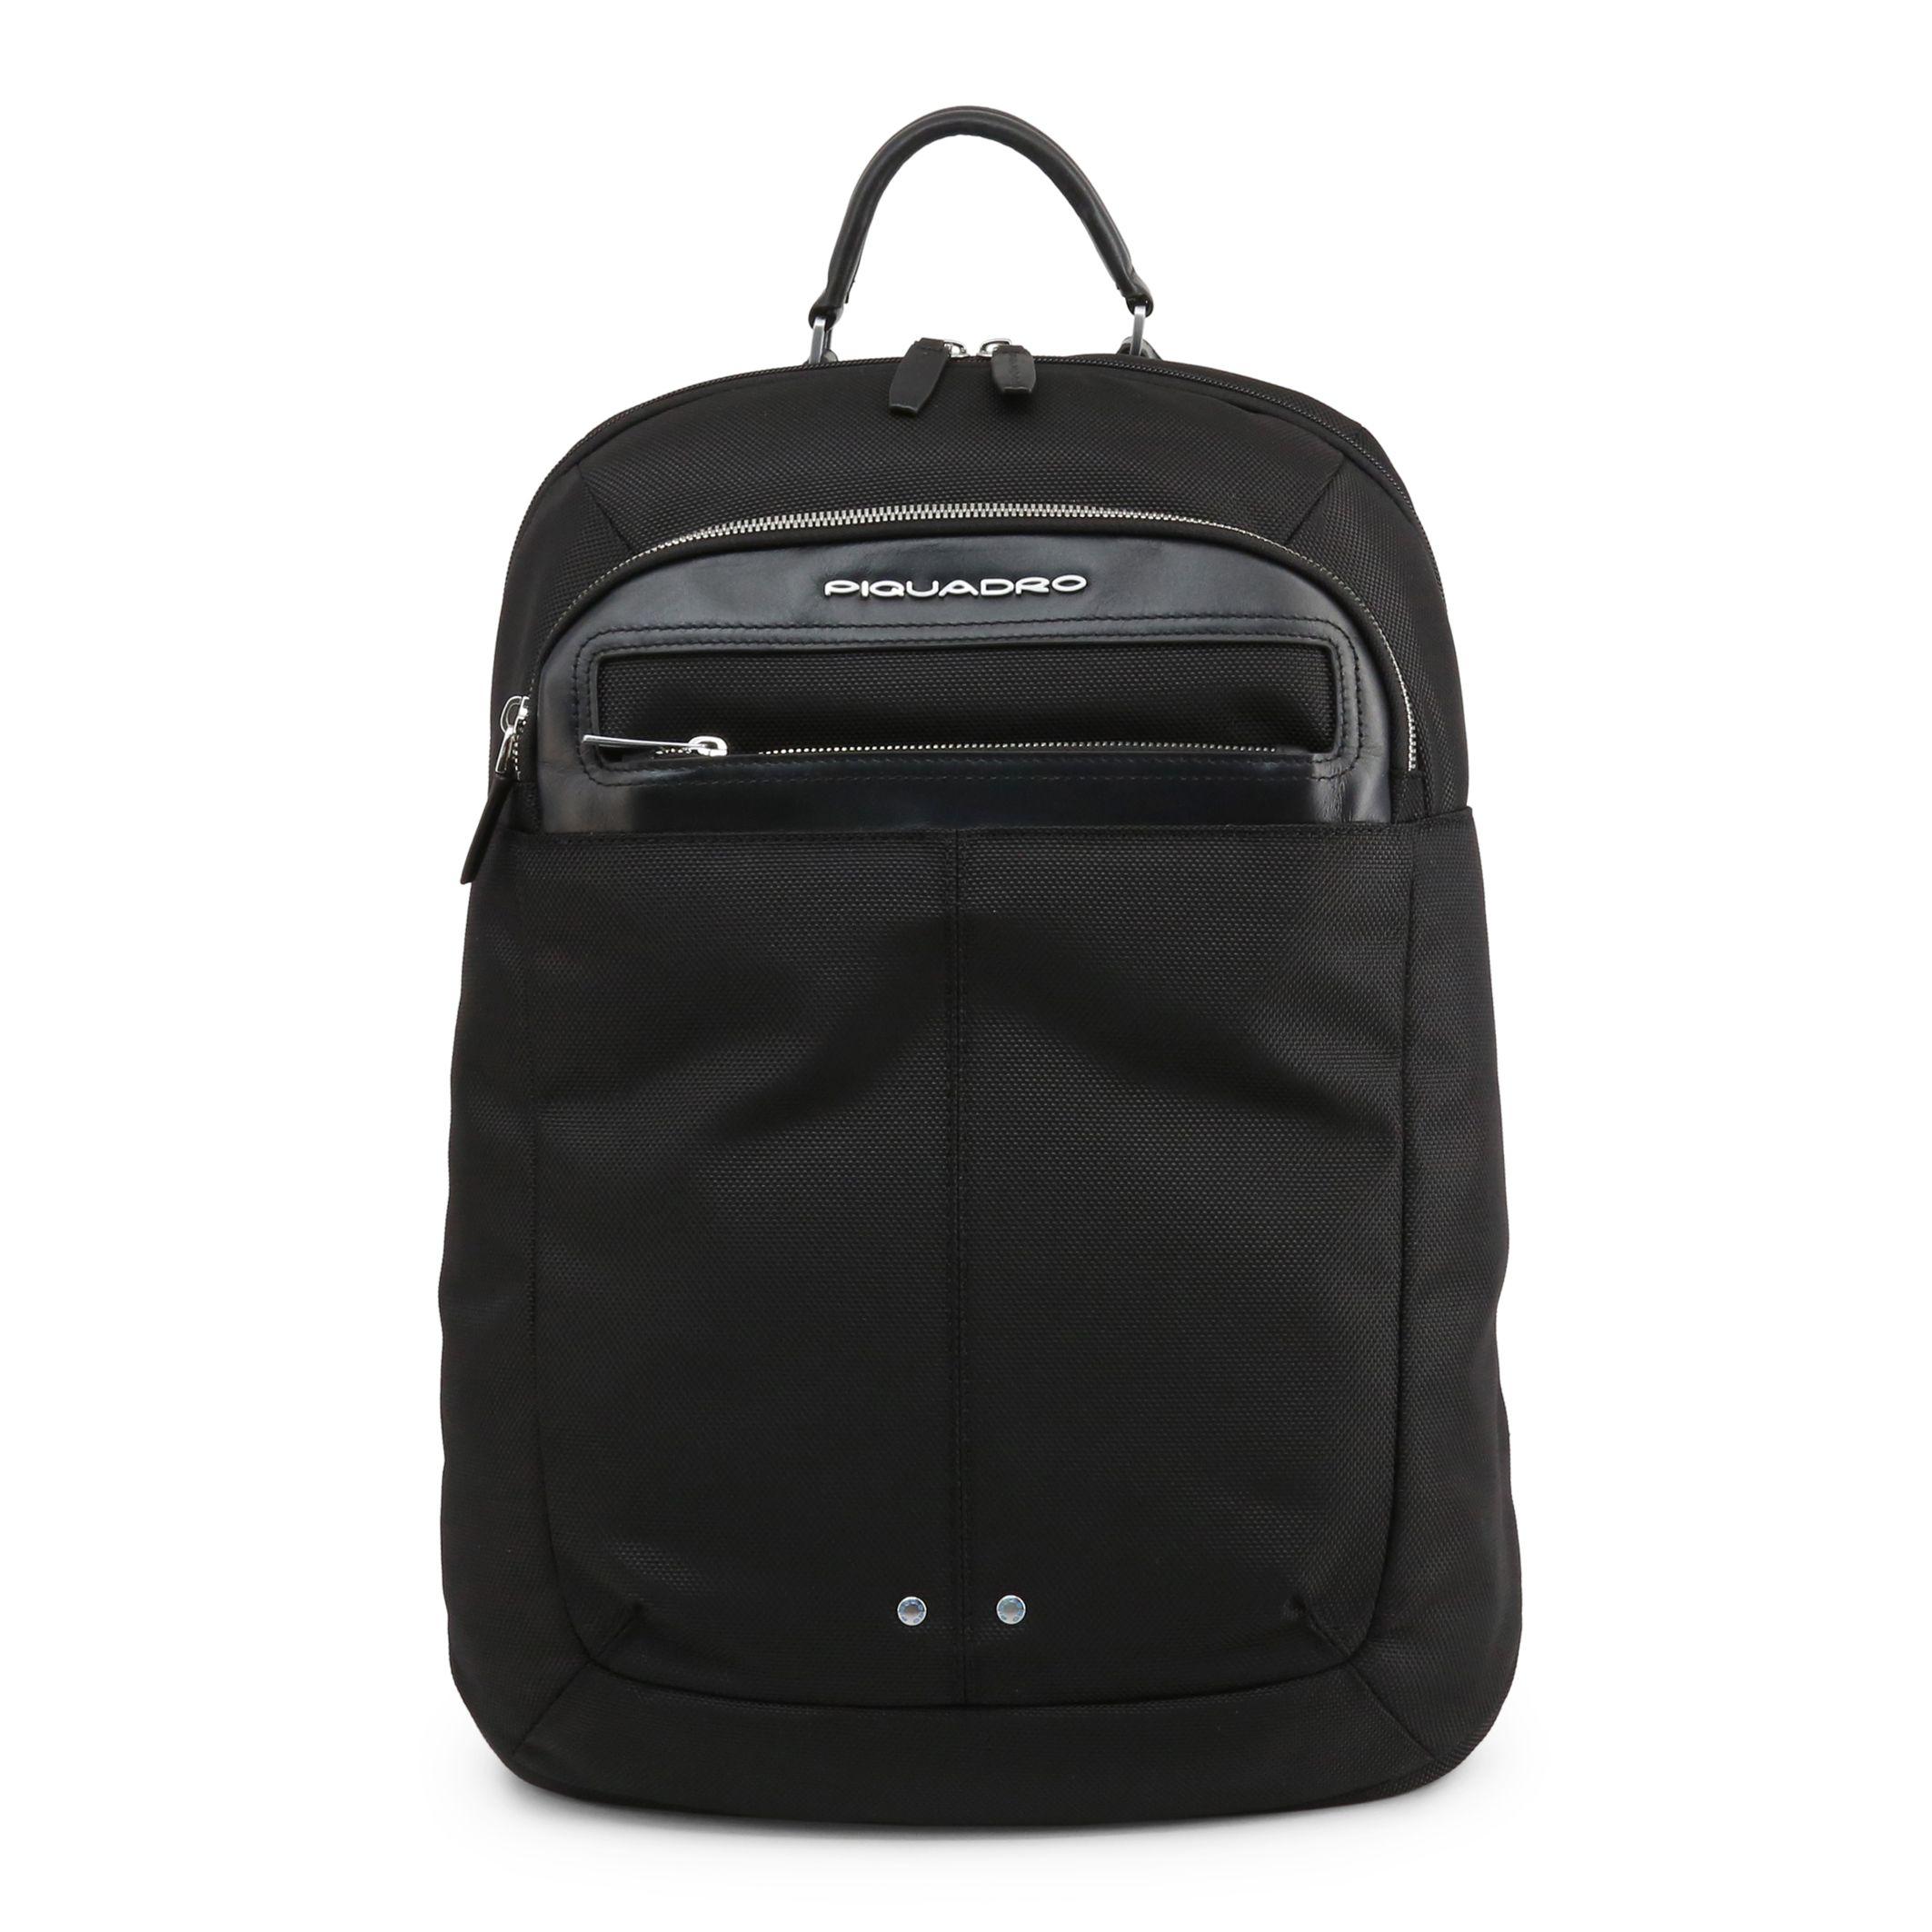 Bags Piquadro – CA3772LK2